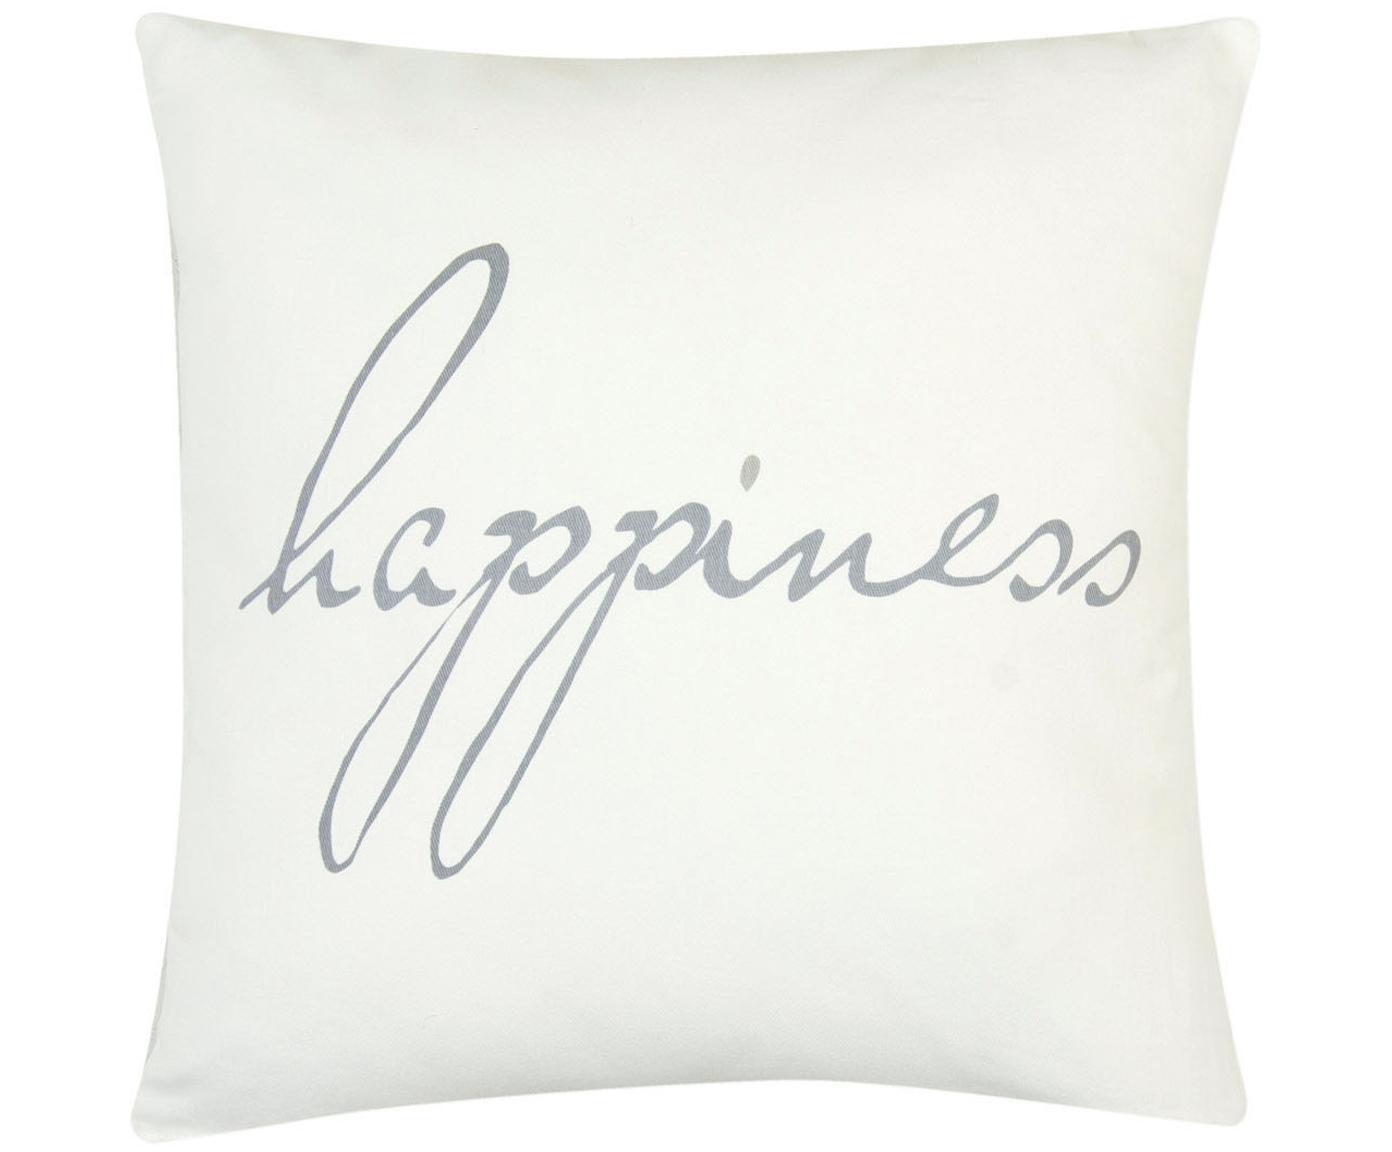 Funda de cojín Happiness, Algodón, tela Panamá, Gris, crema, An 40 x L 40 cm